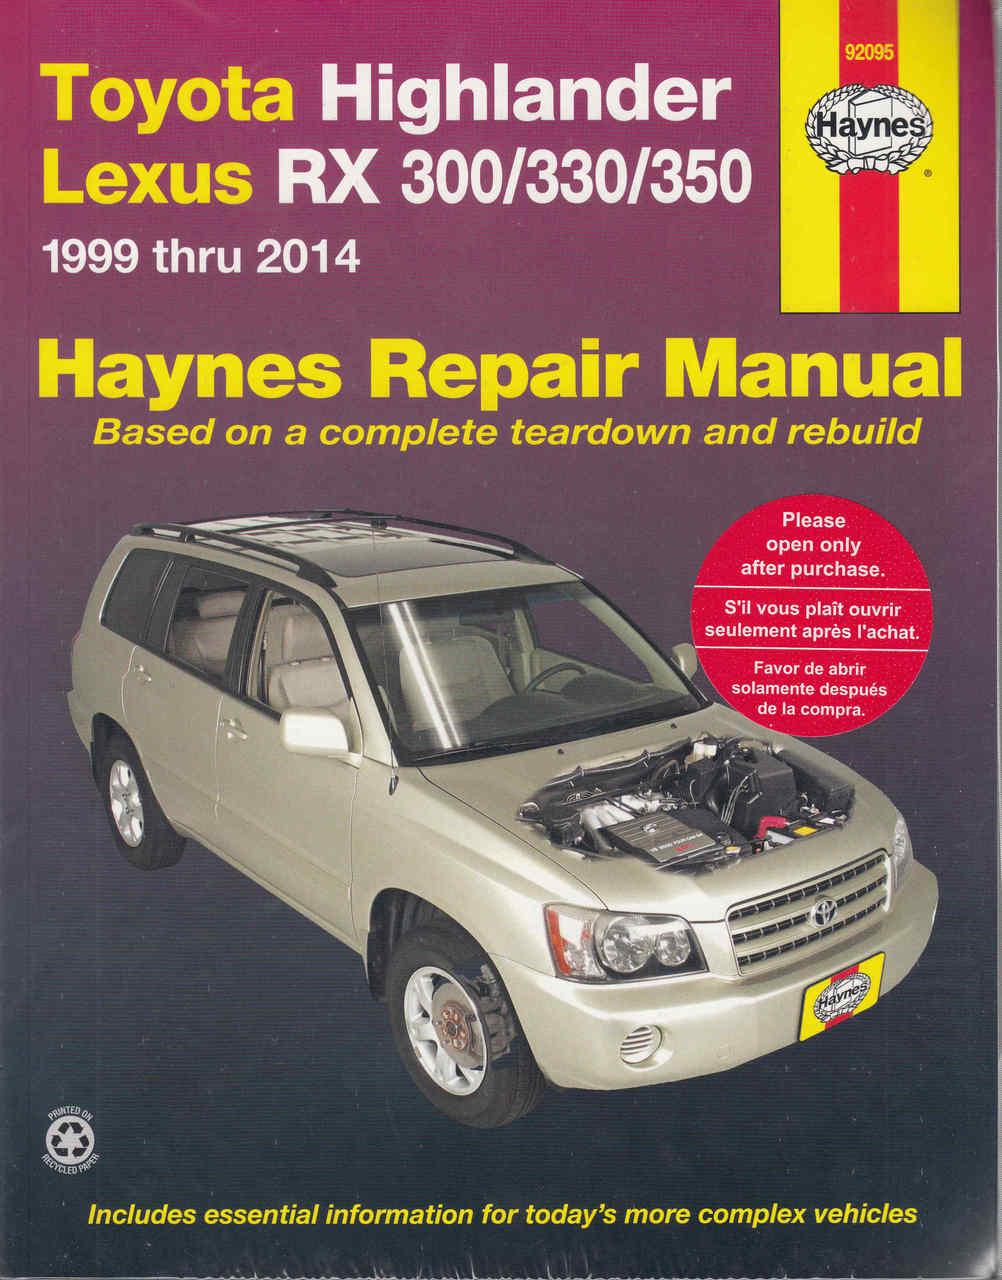 toyota kluger highlander lexus rx300 rx330 rx350 1999 2014 rh automotobookshop com au 2000 lexus rx300 service manual lexus rx 300 service manual